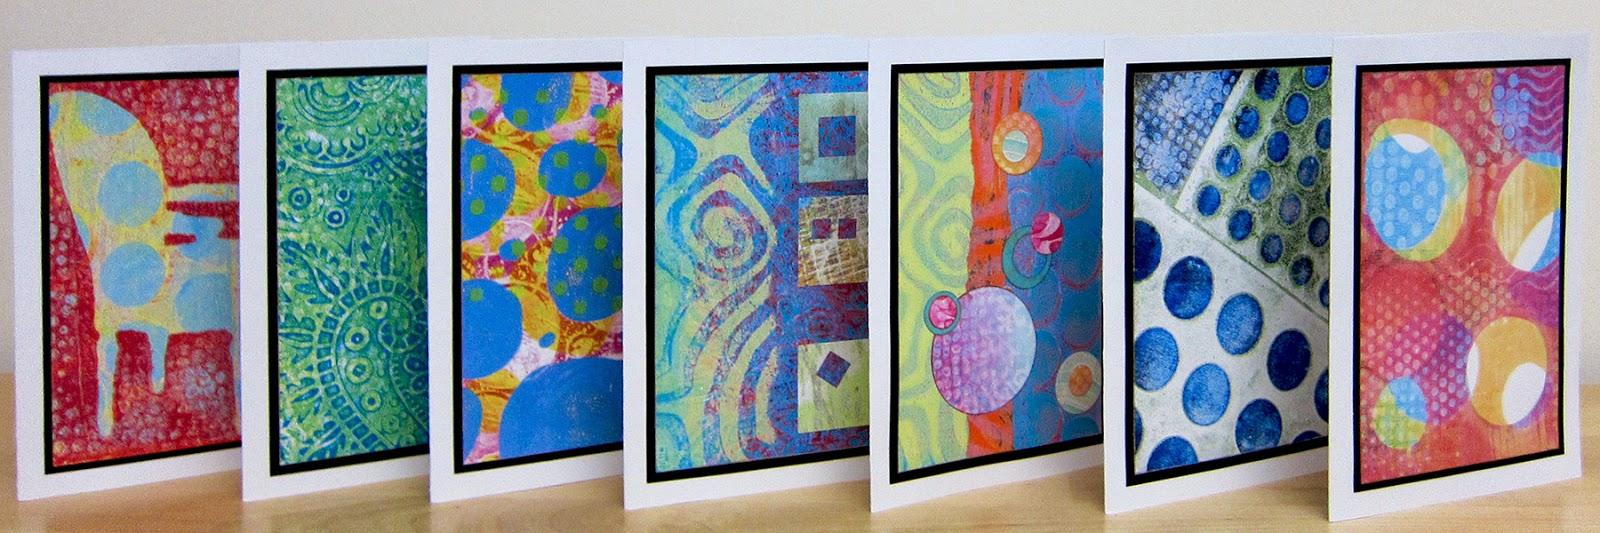 gelli plate 3 x 5 inches gelli arts monoprinting tag art